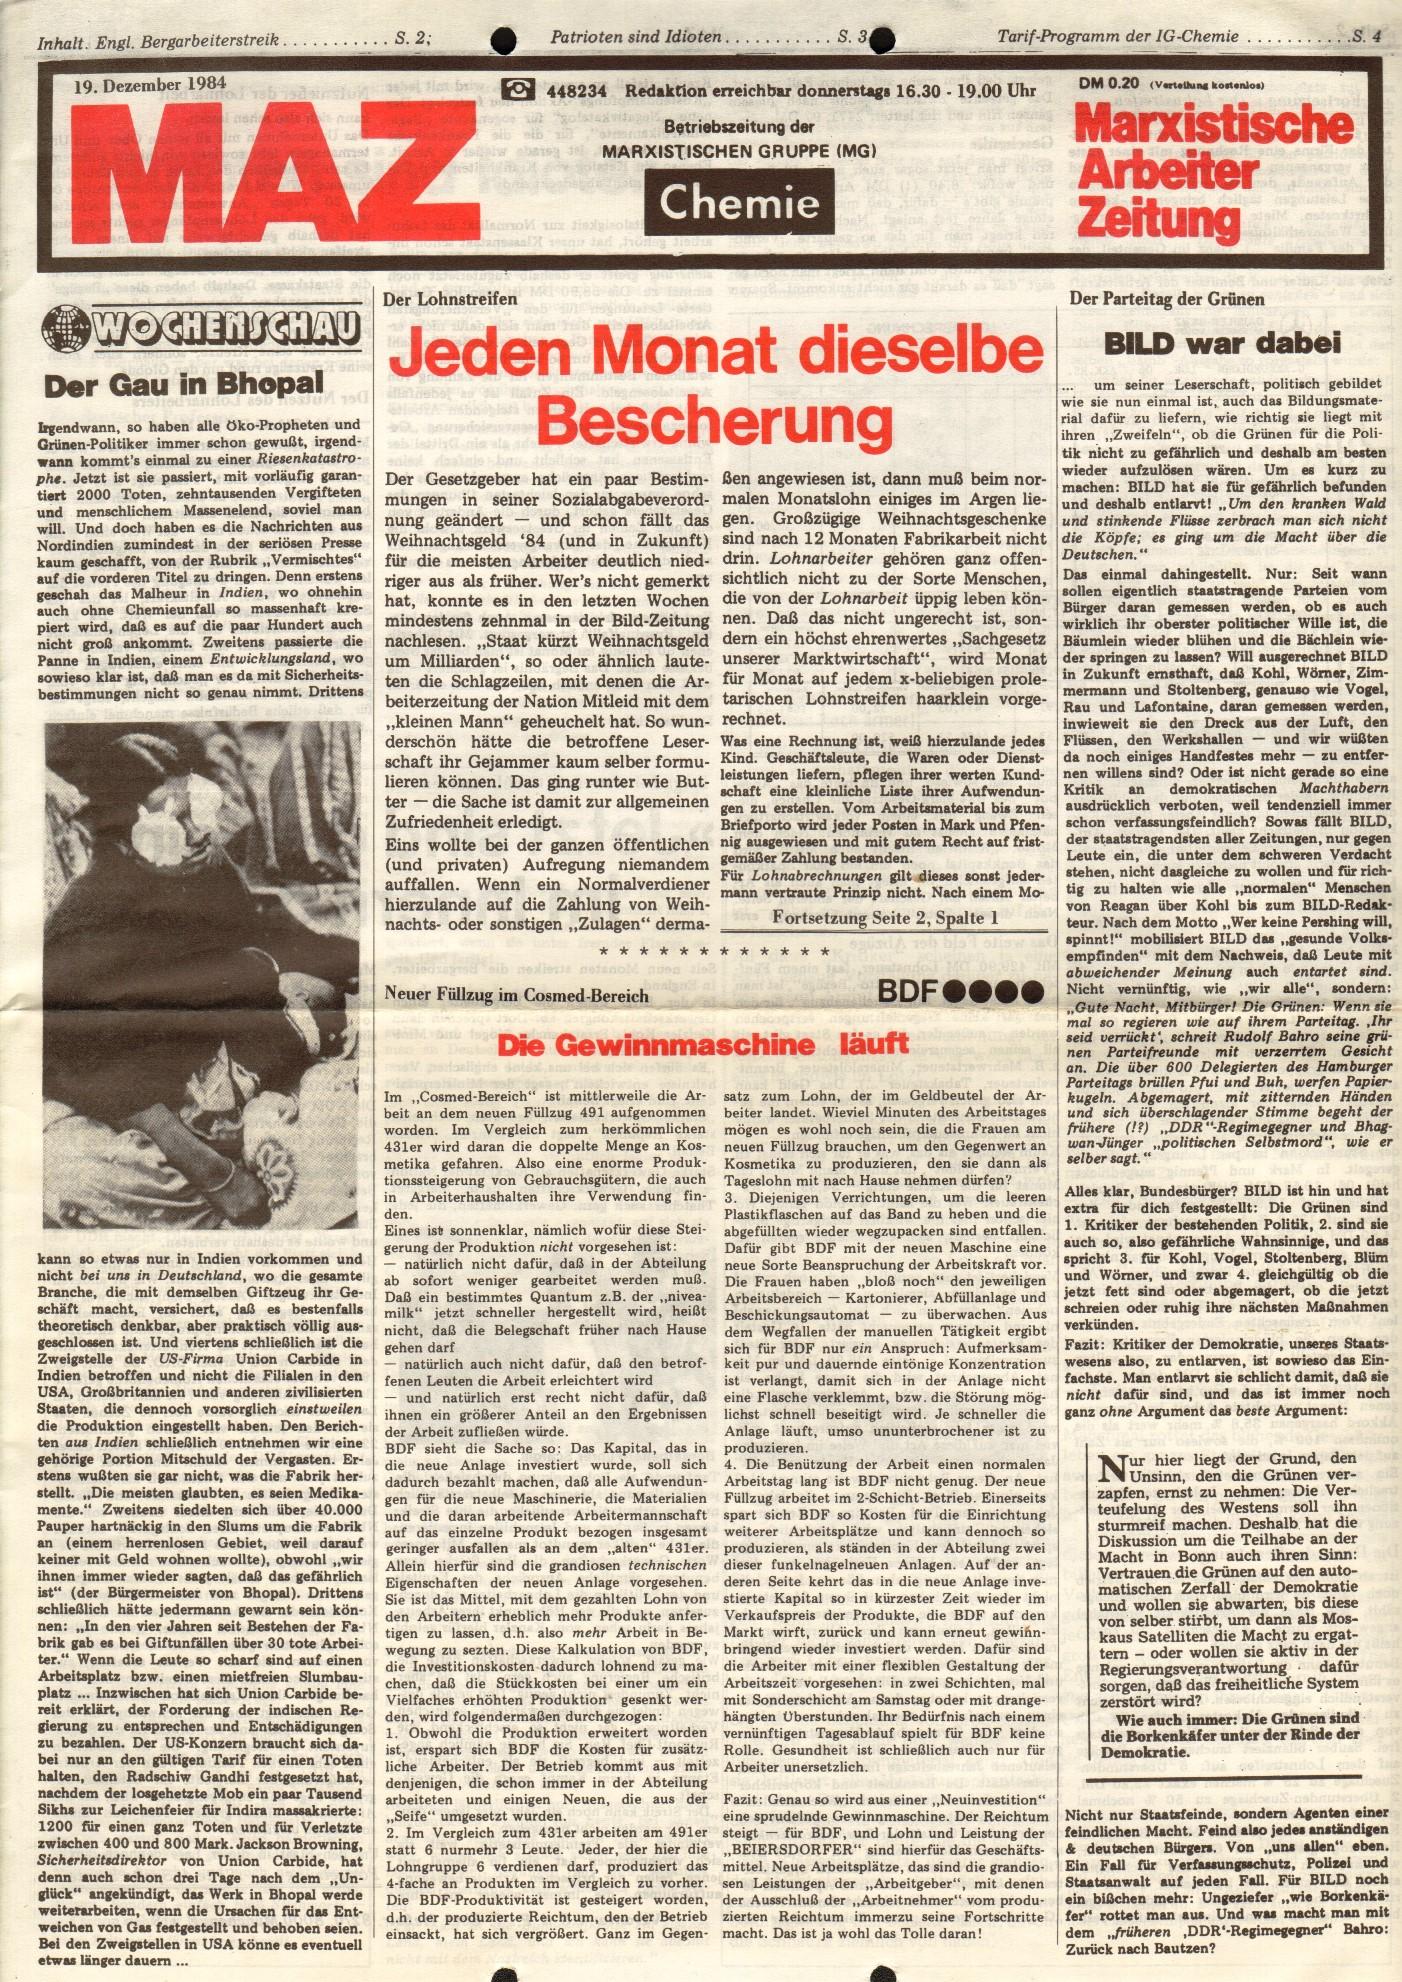 Hamburg_MG_MAZ_Chemie_19841219_01